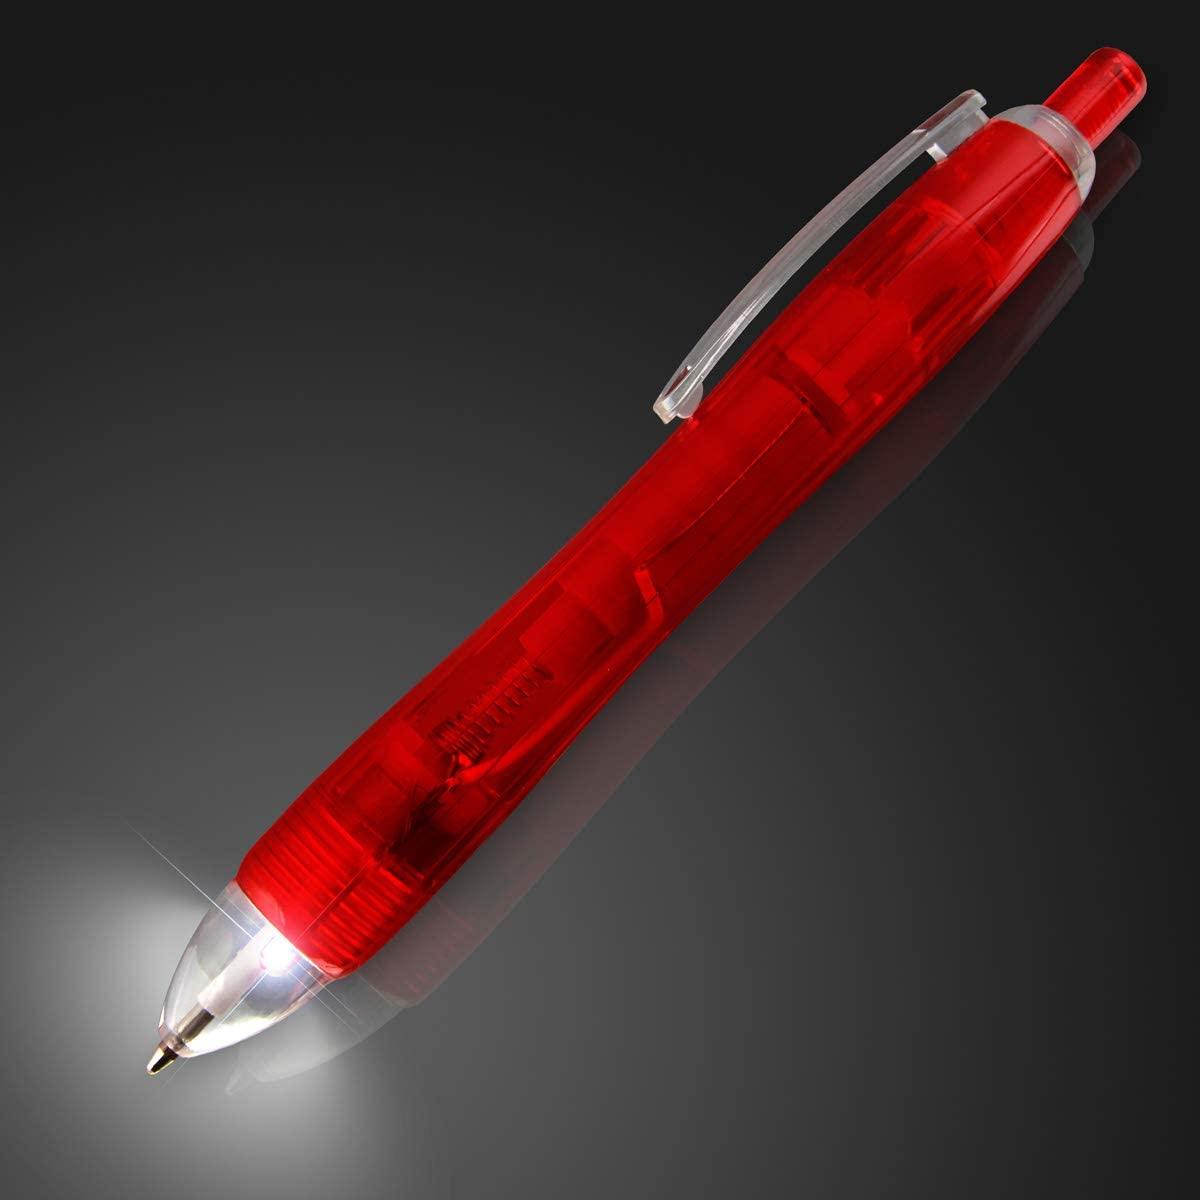 Red Light Tip Pen with White LED